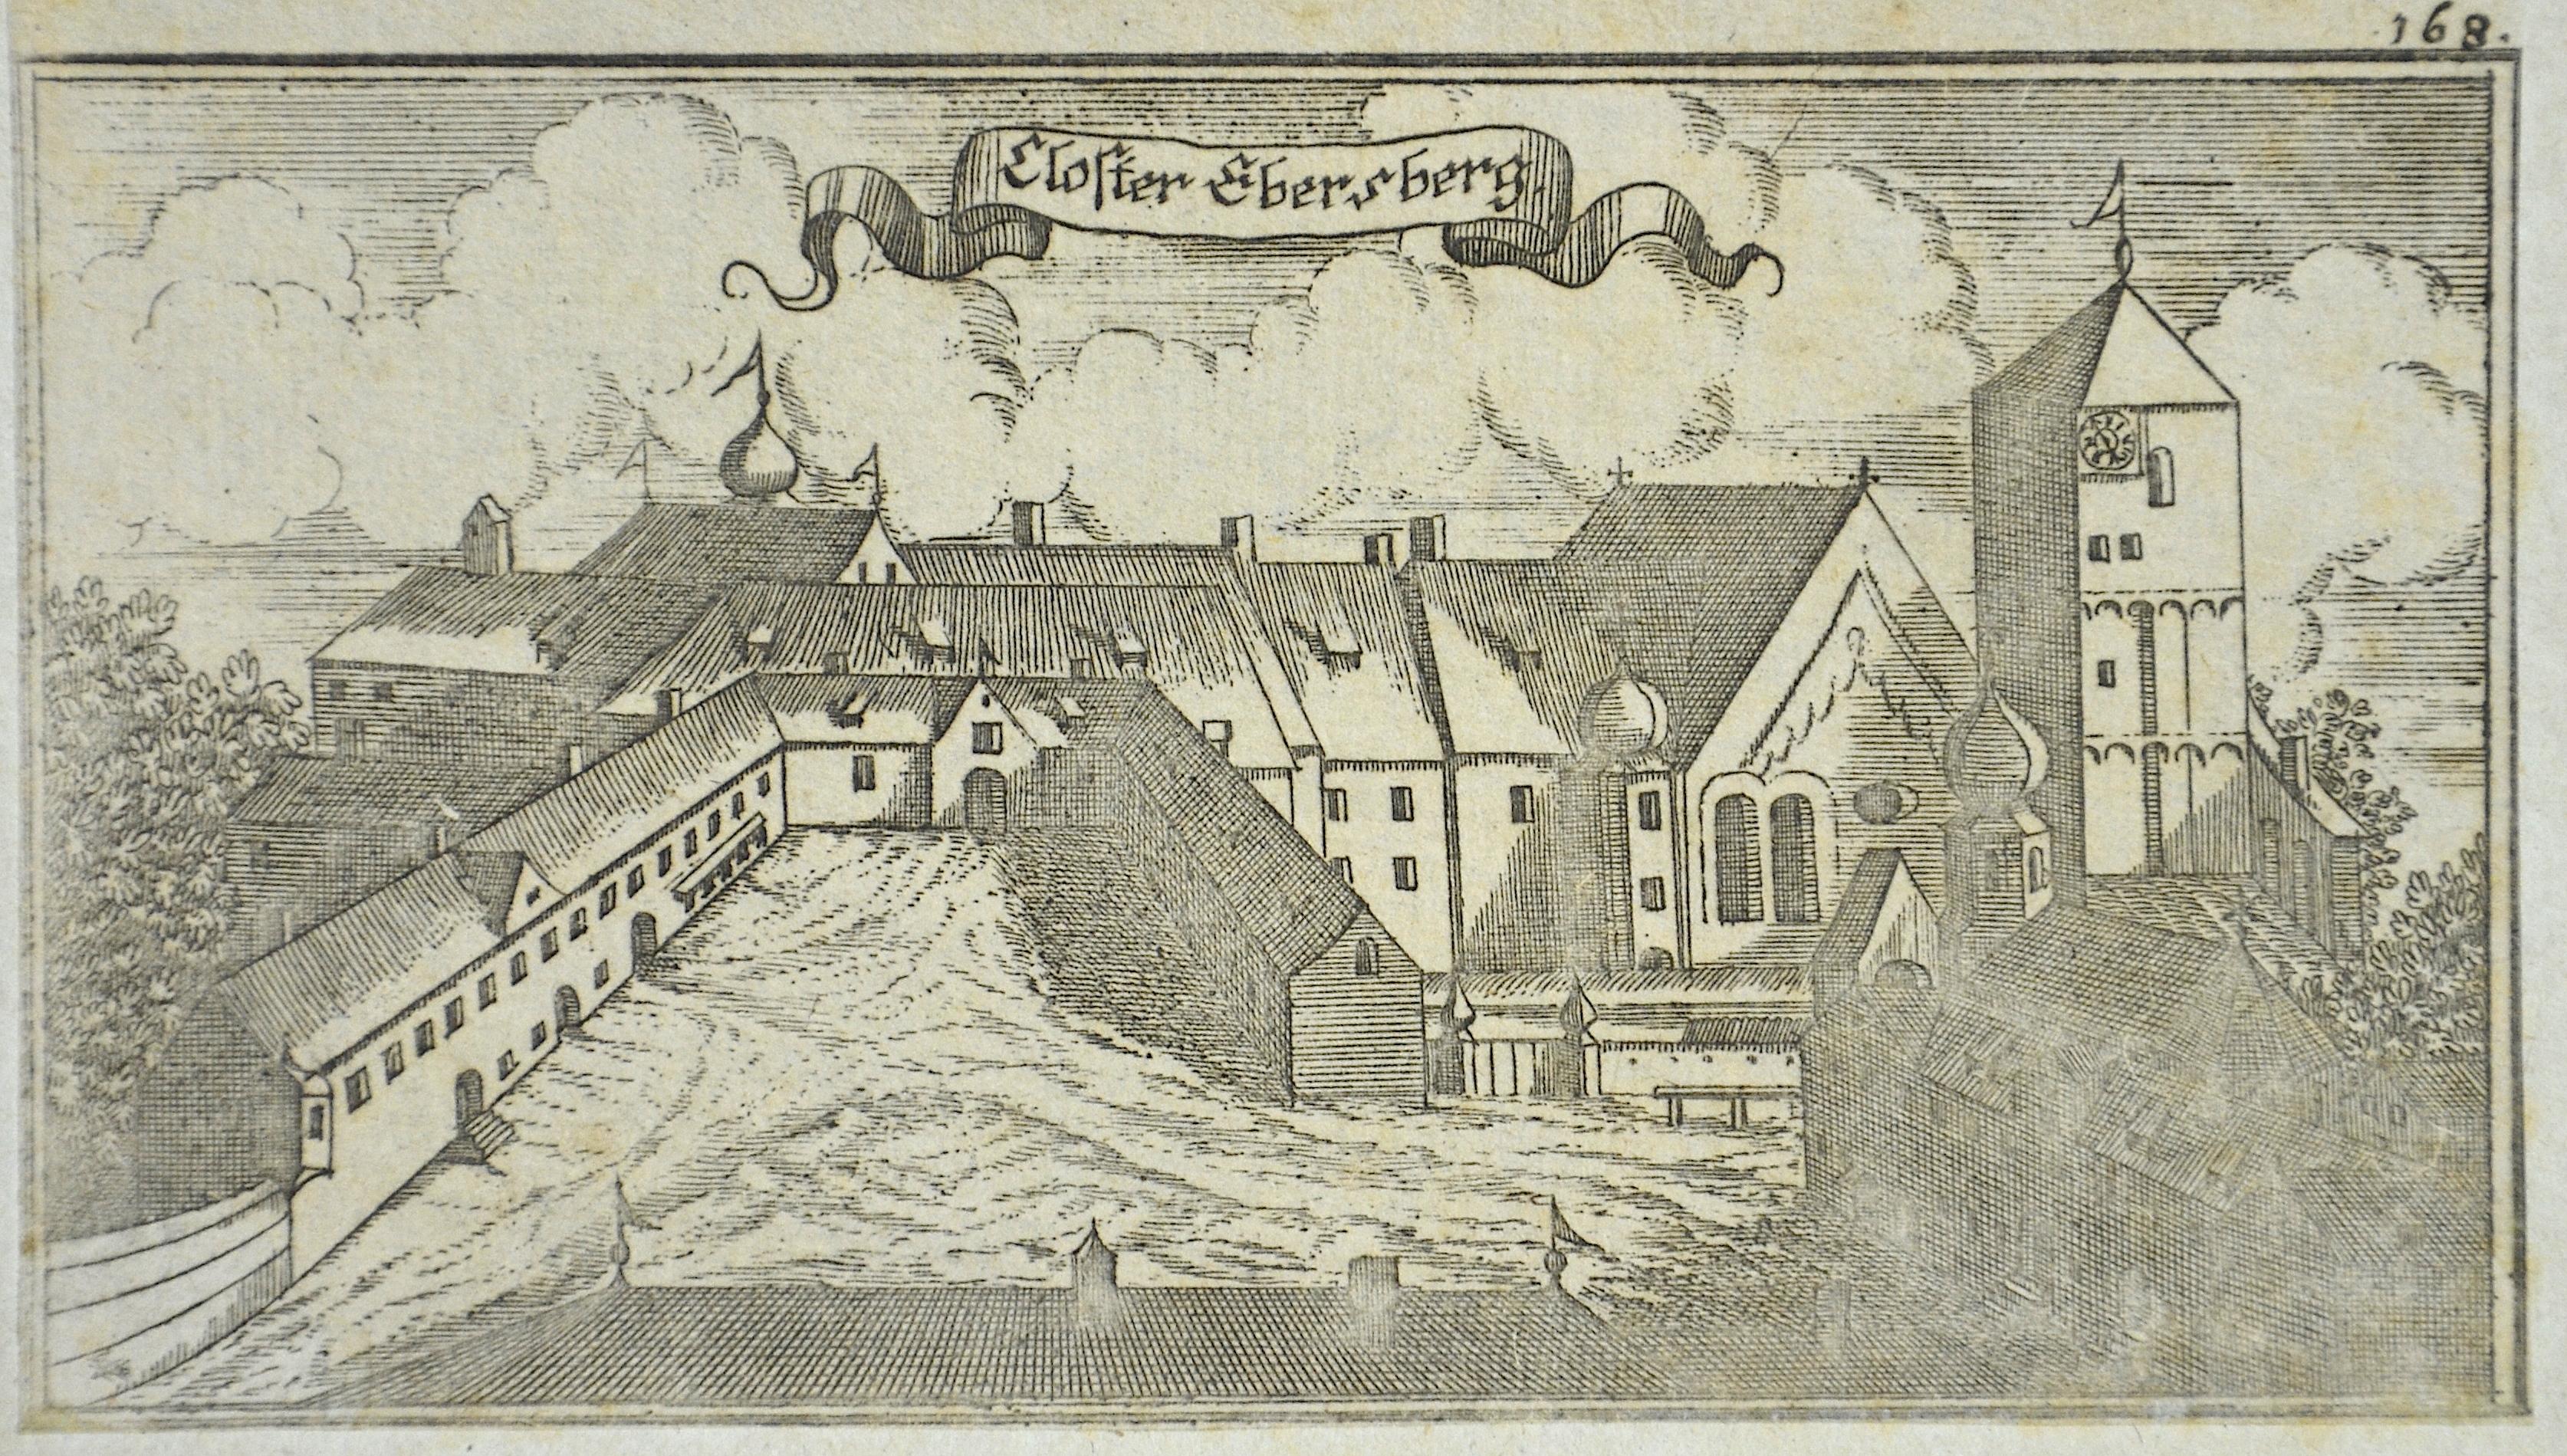 Ertl Anton Wilhelm Closter Ebersberg.